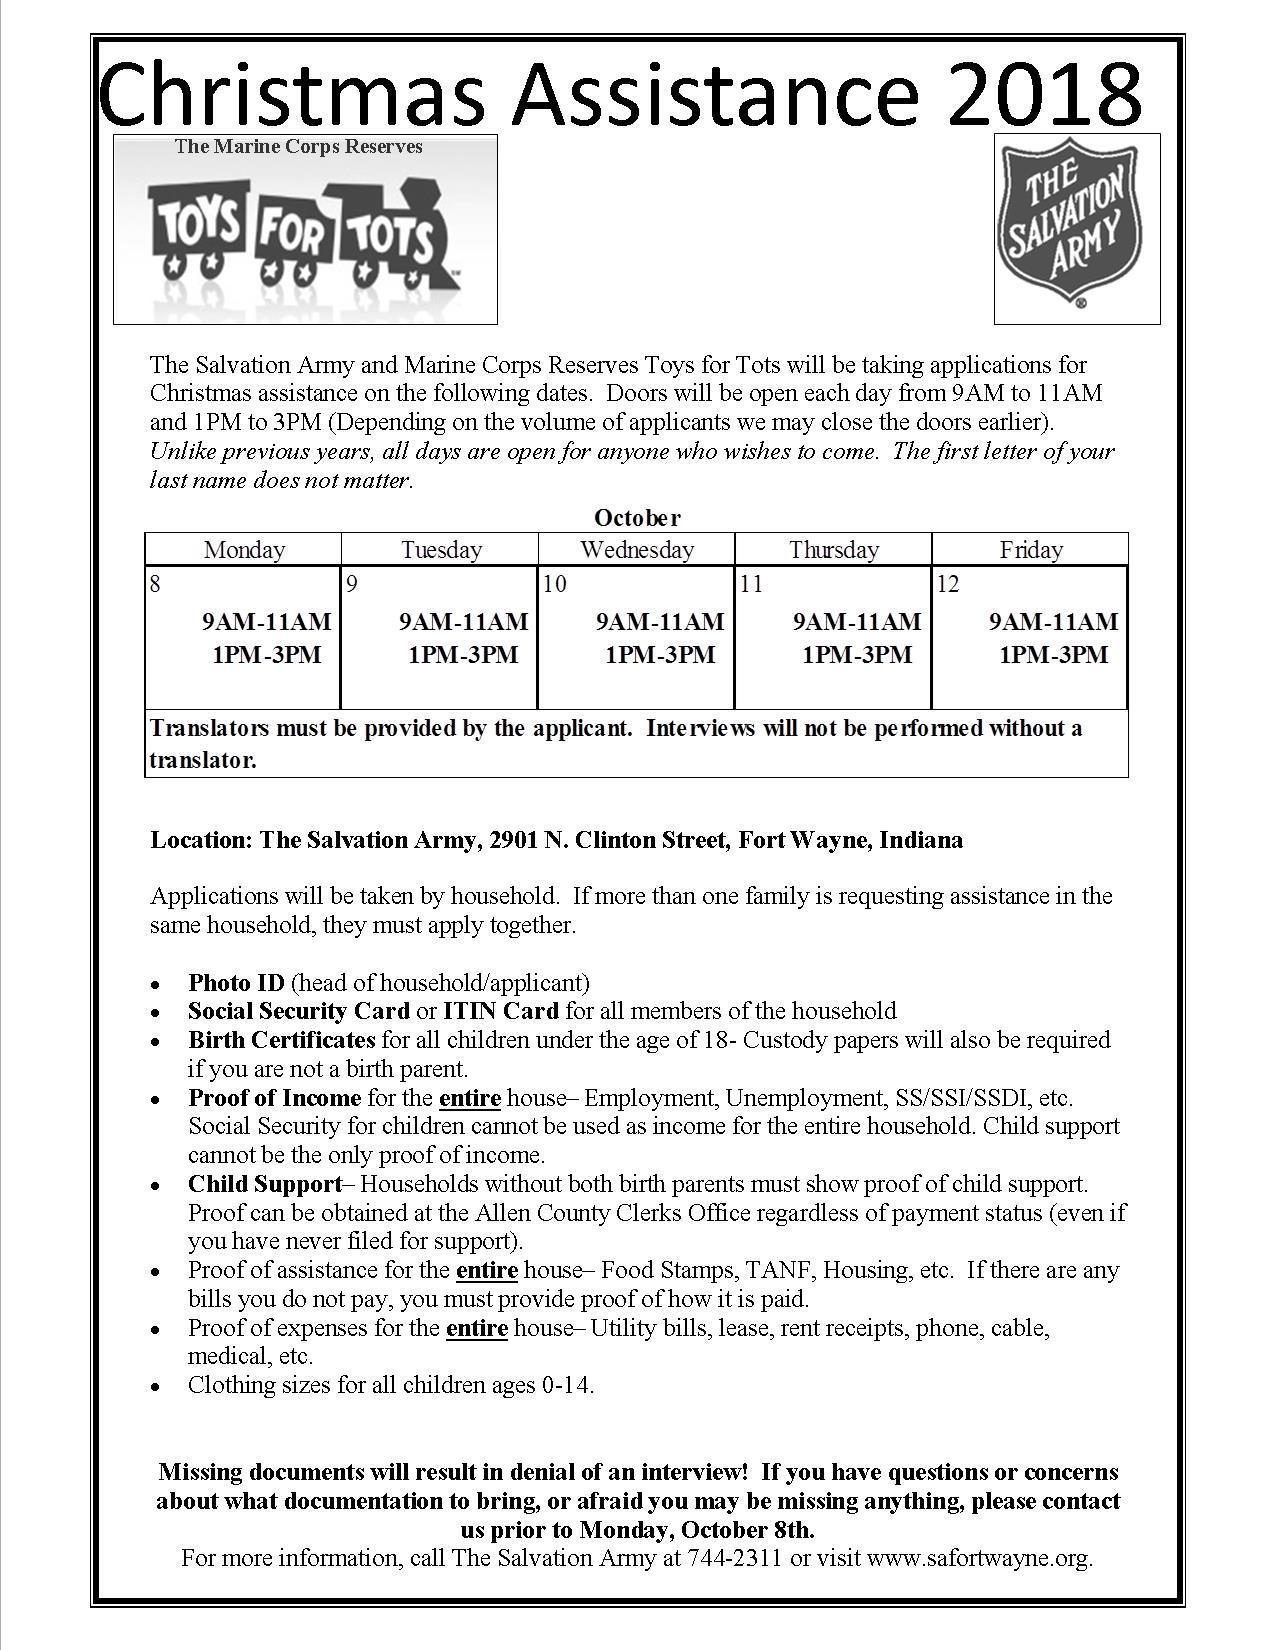 Christmas Assistance Intake - Fort Wayne Salvation Army